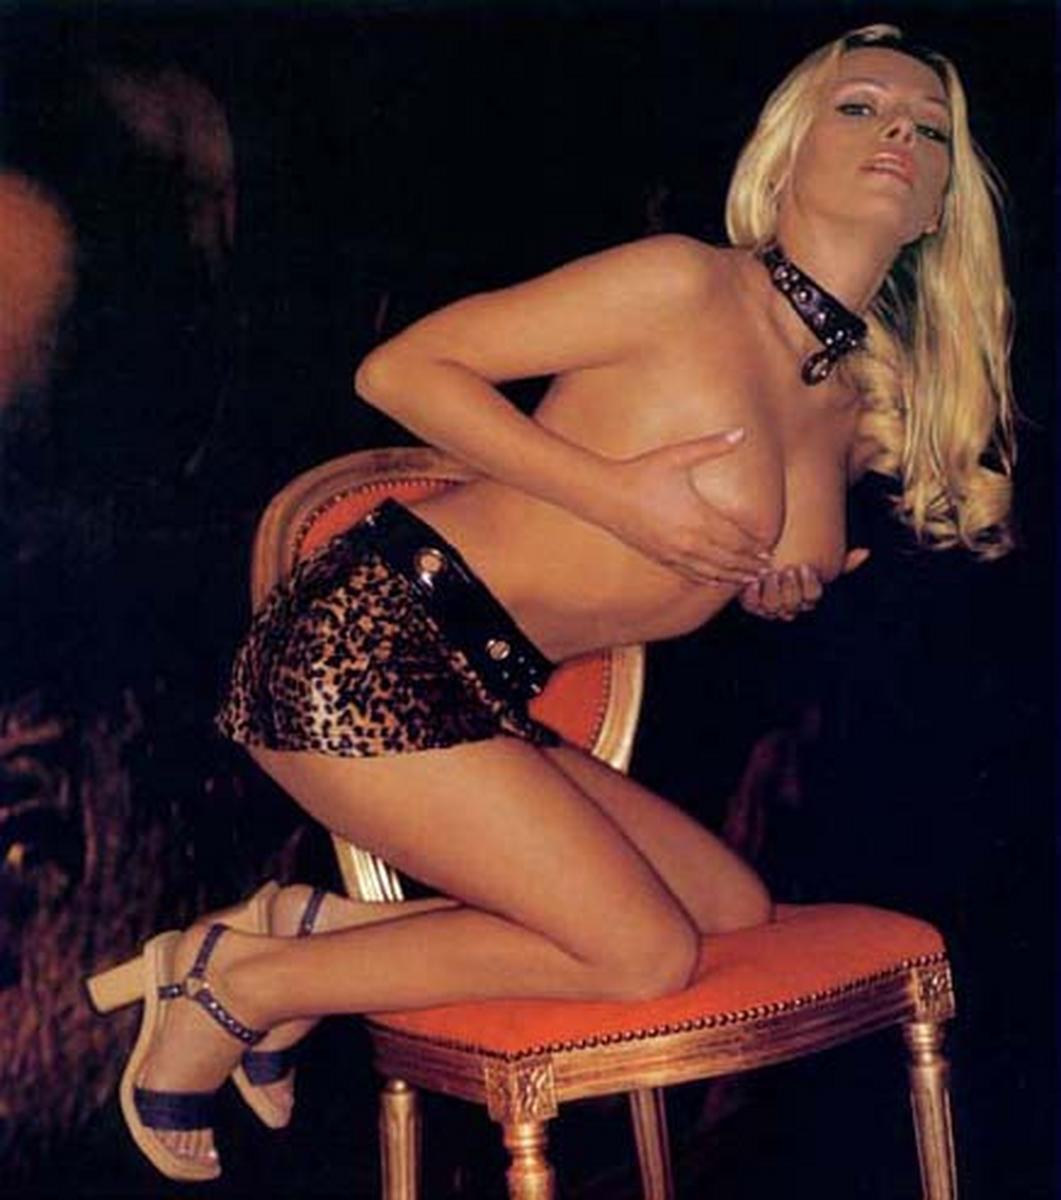 Фото голая ирина аллегрова фото 14 фотография